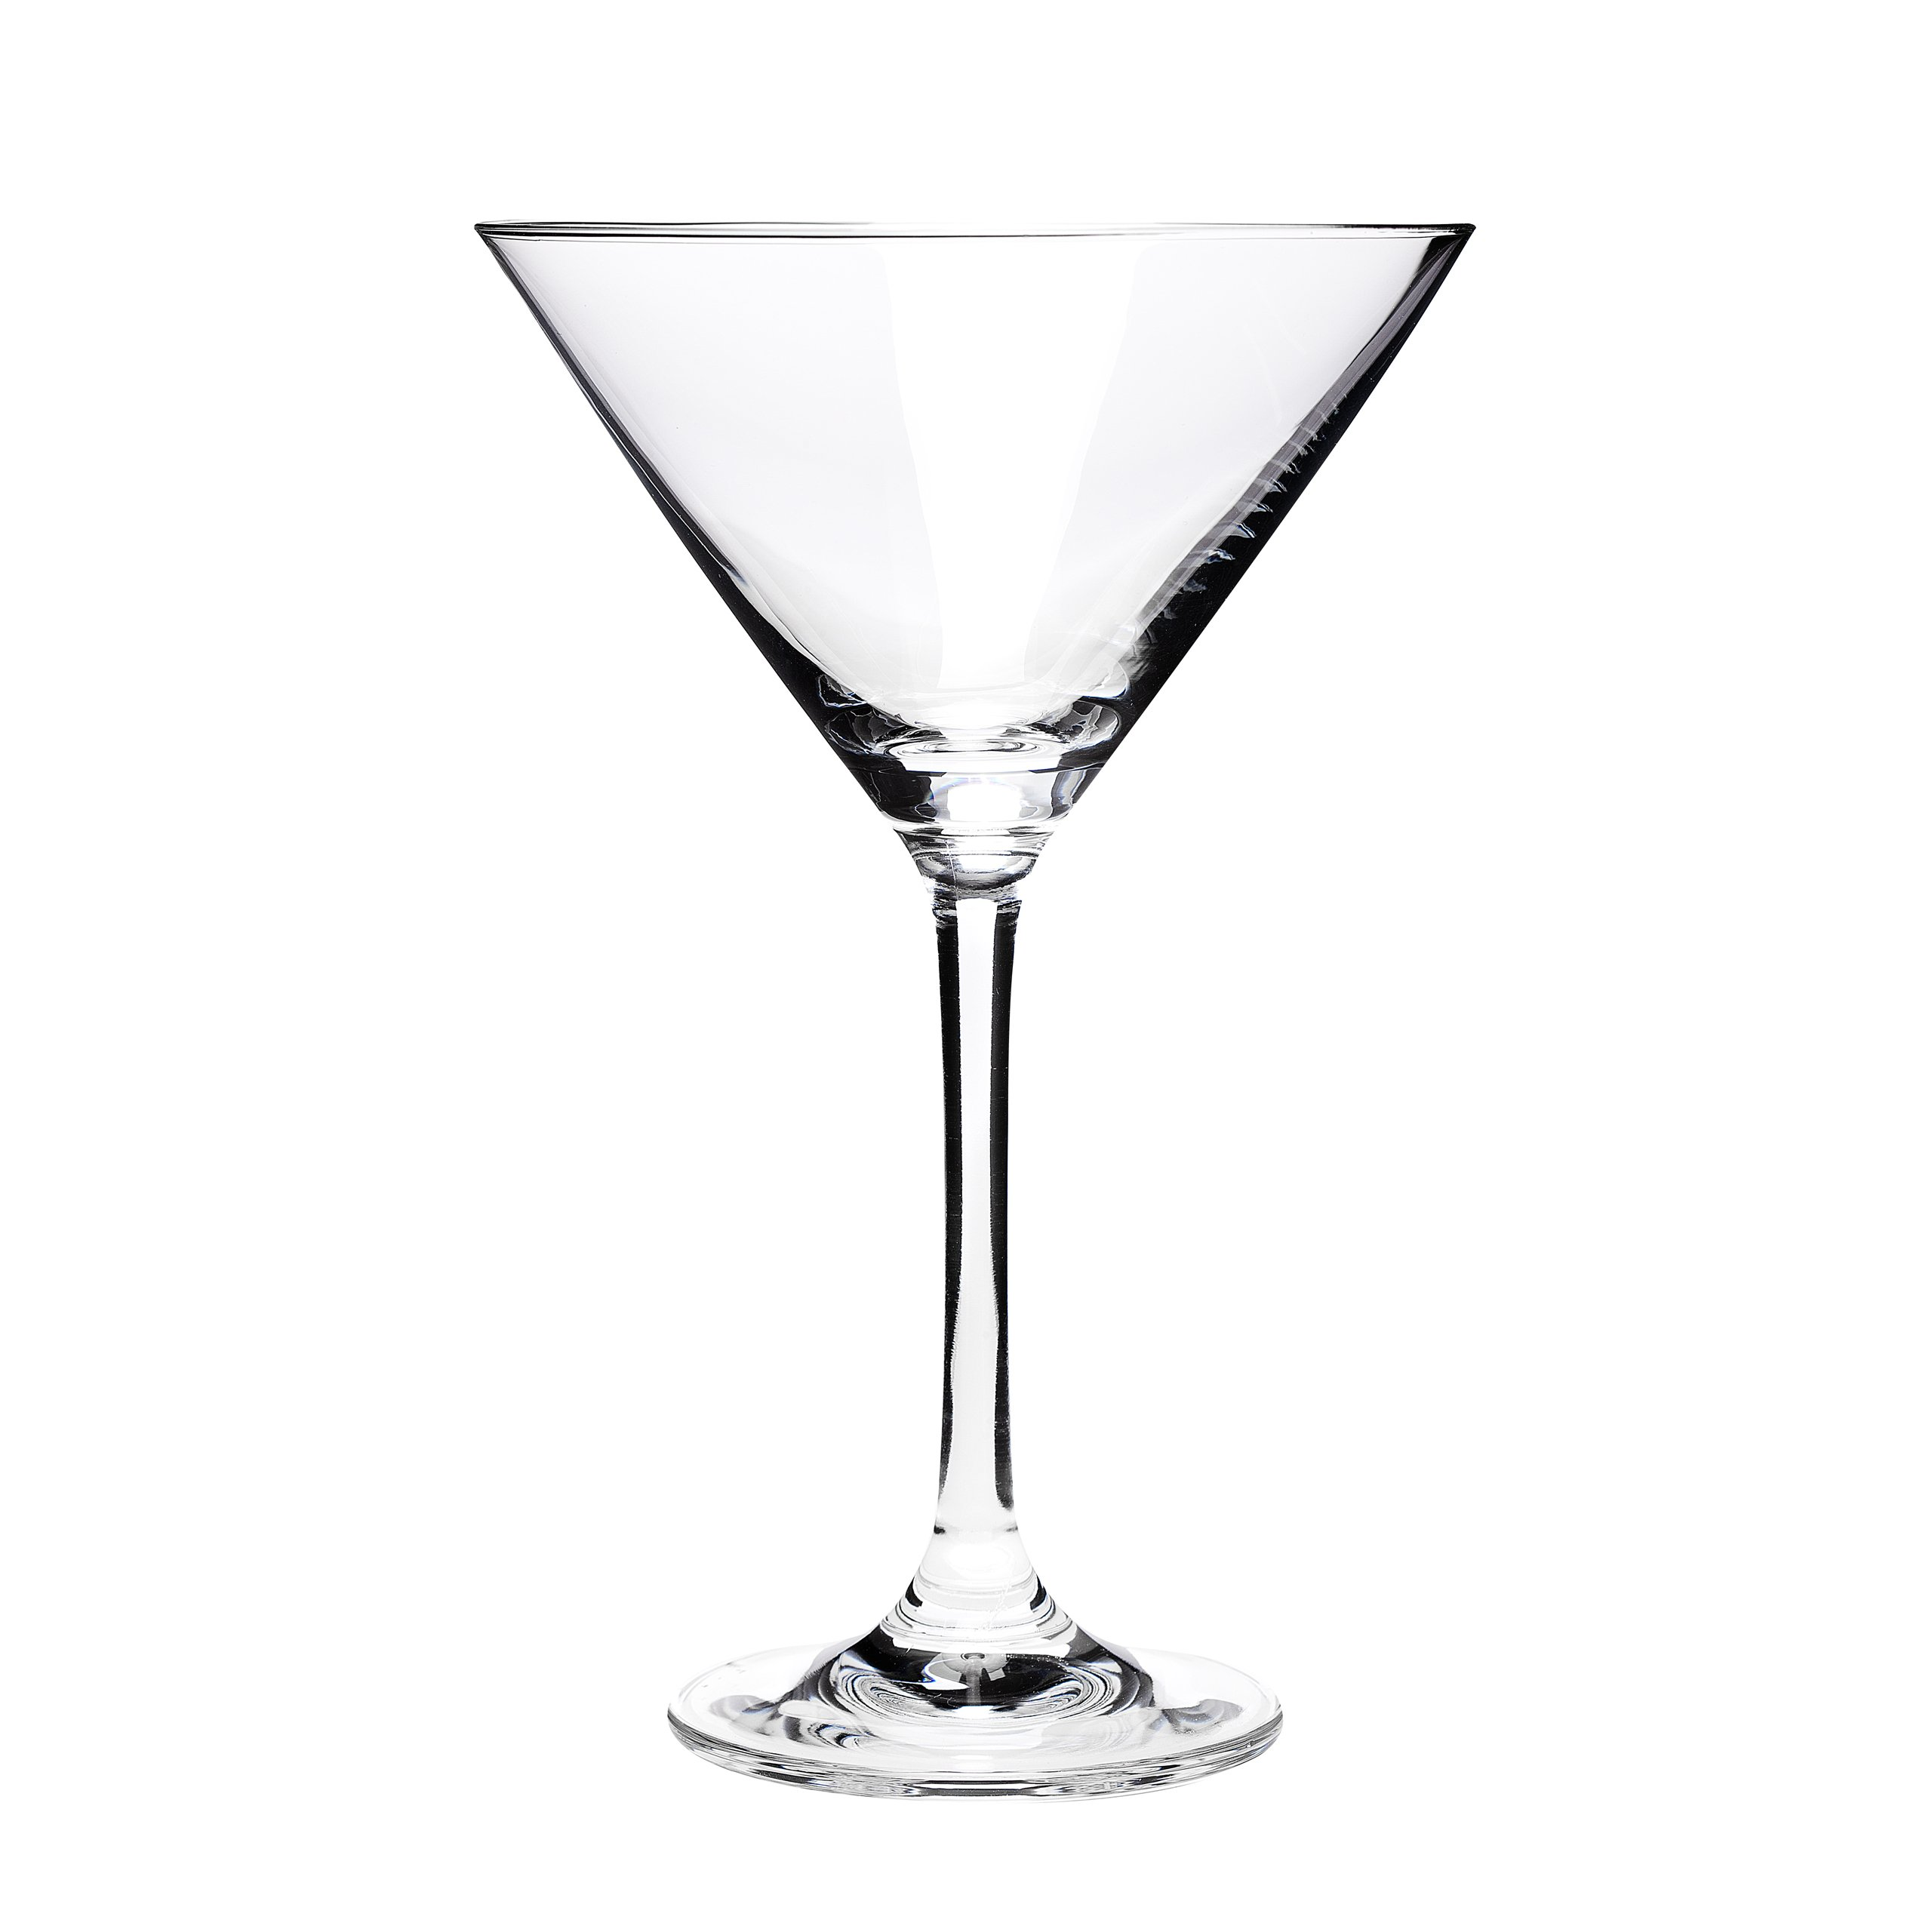 Oenophilia Perfect Stemware Martini Glass, Clear, Set of 6